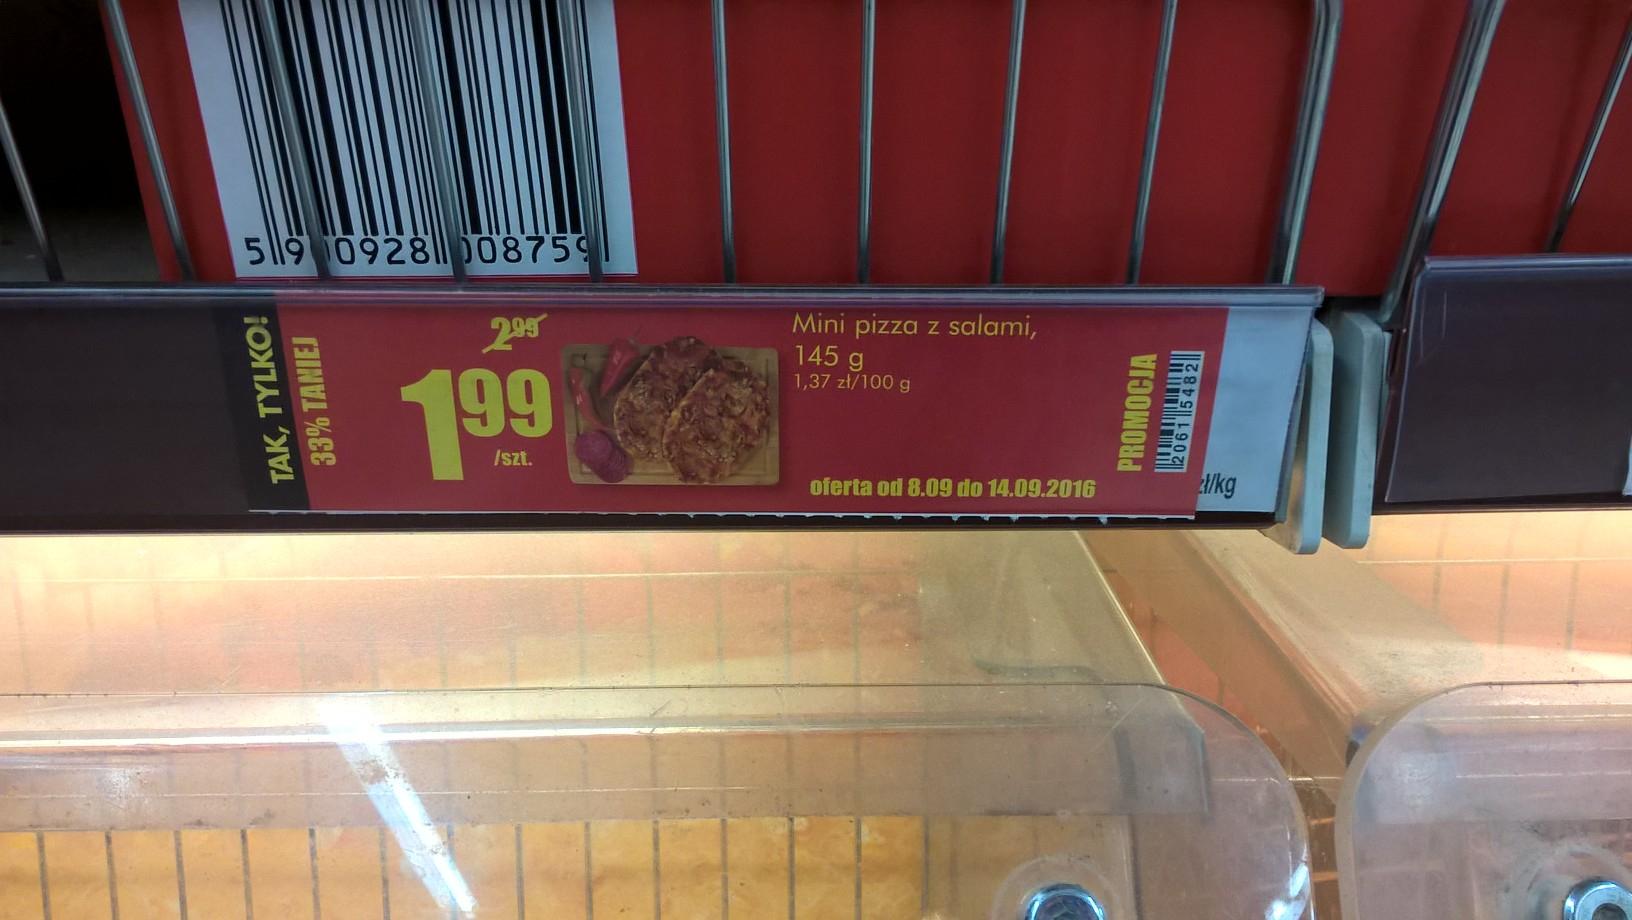 Mini Pizza z Salami 145g @Biedronka